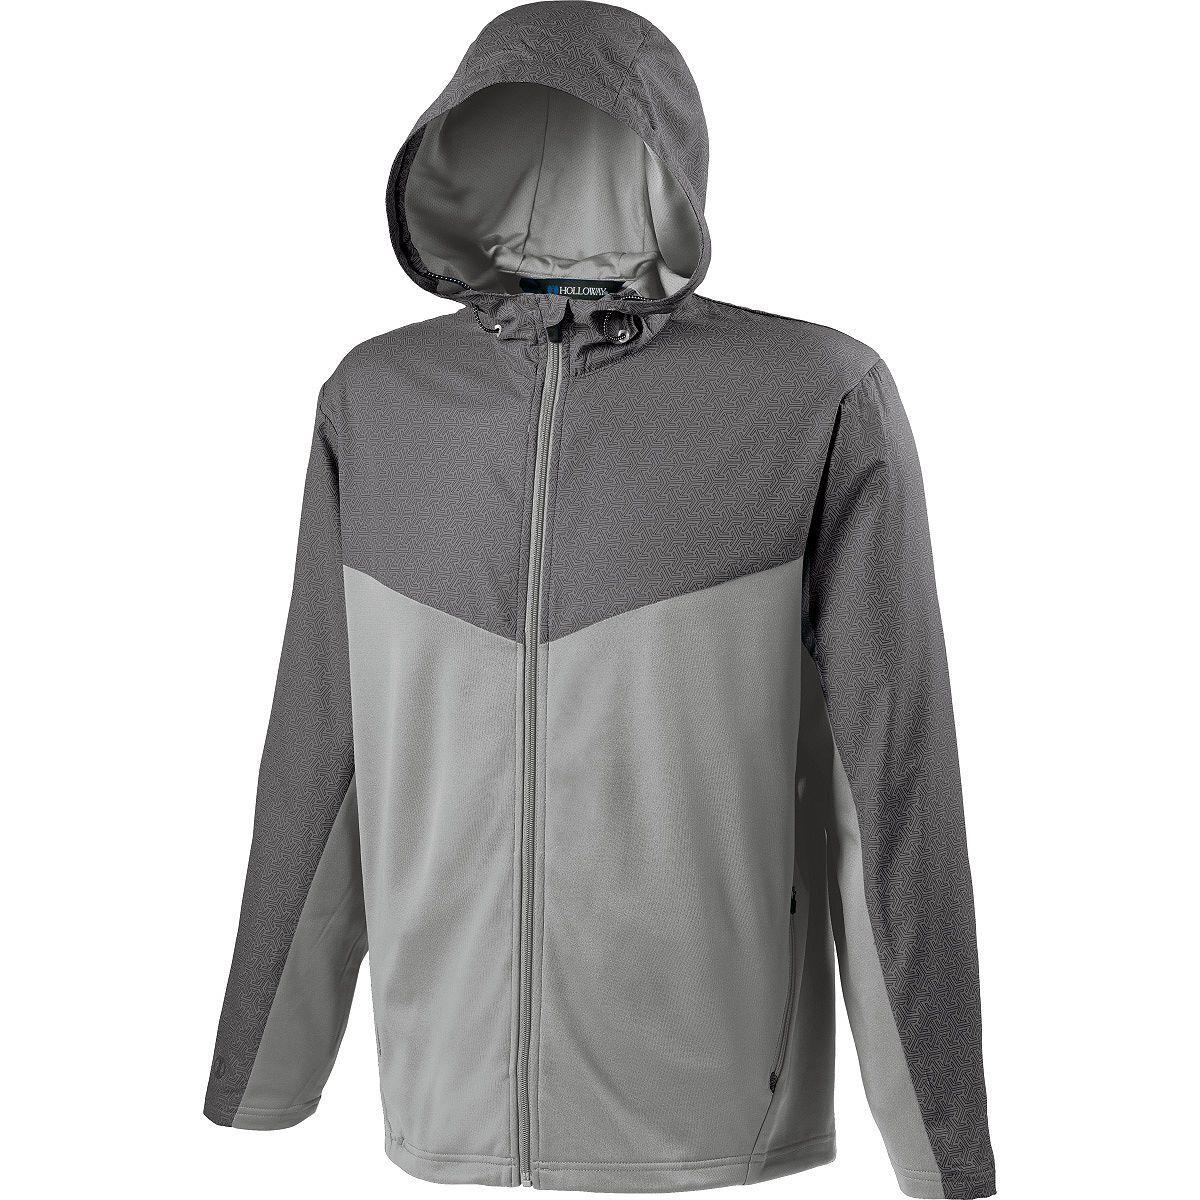 Adult Crossover Jacket - GREY PRINT/GREY